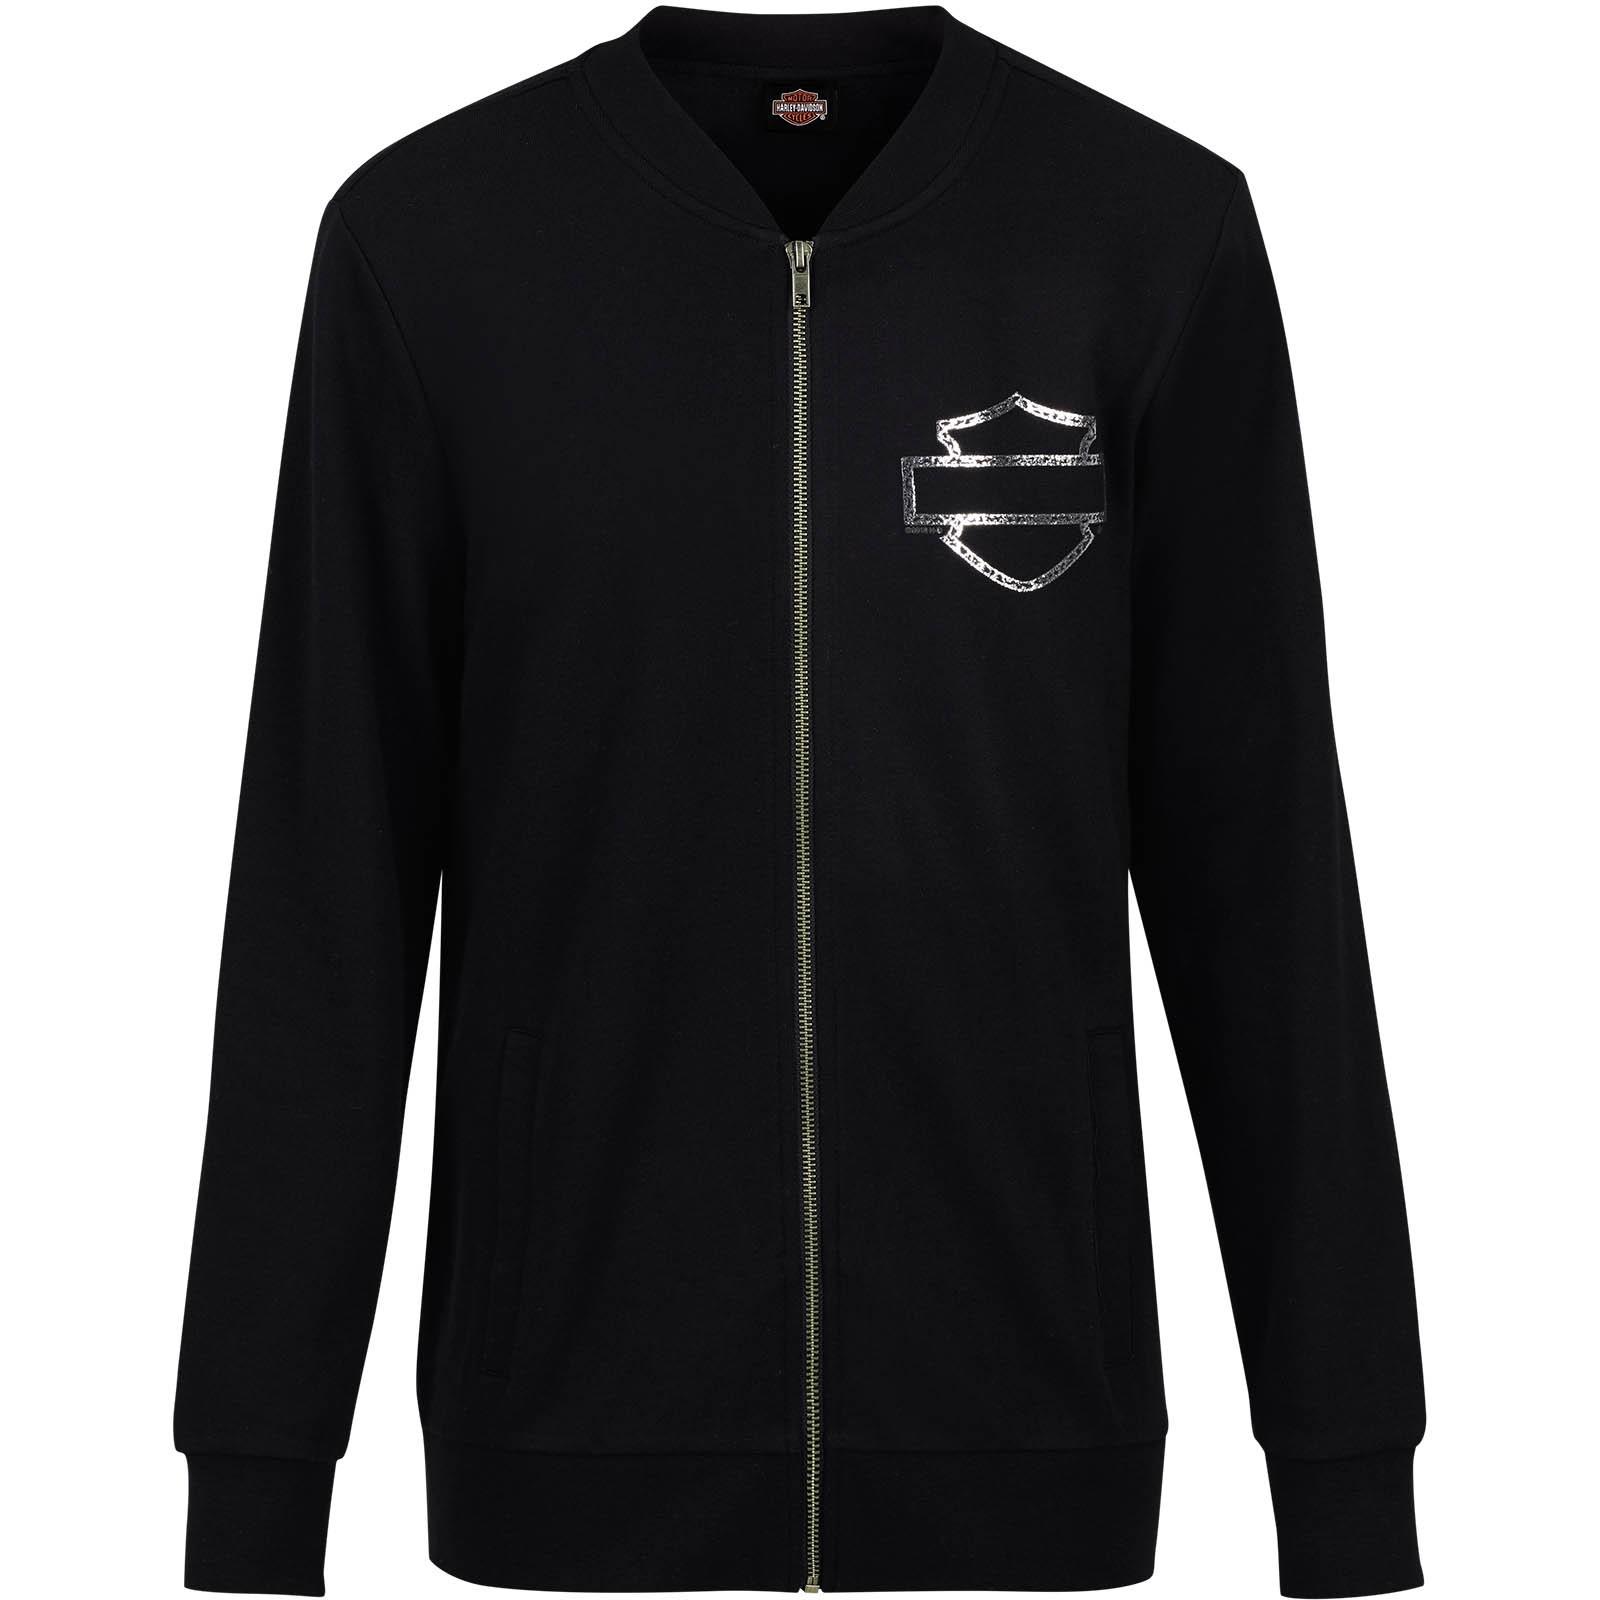 Harley-Davidson Women's French Terry Bomber Jacket - Overseas Tour | Iconic Logo